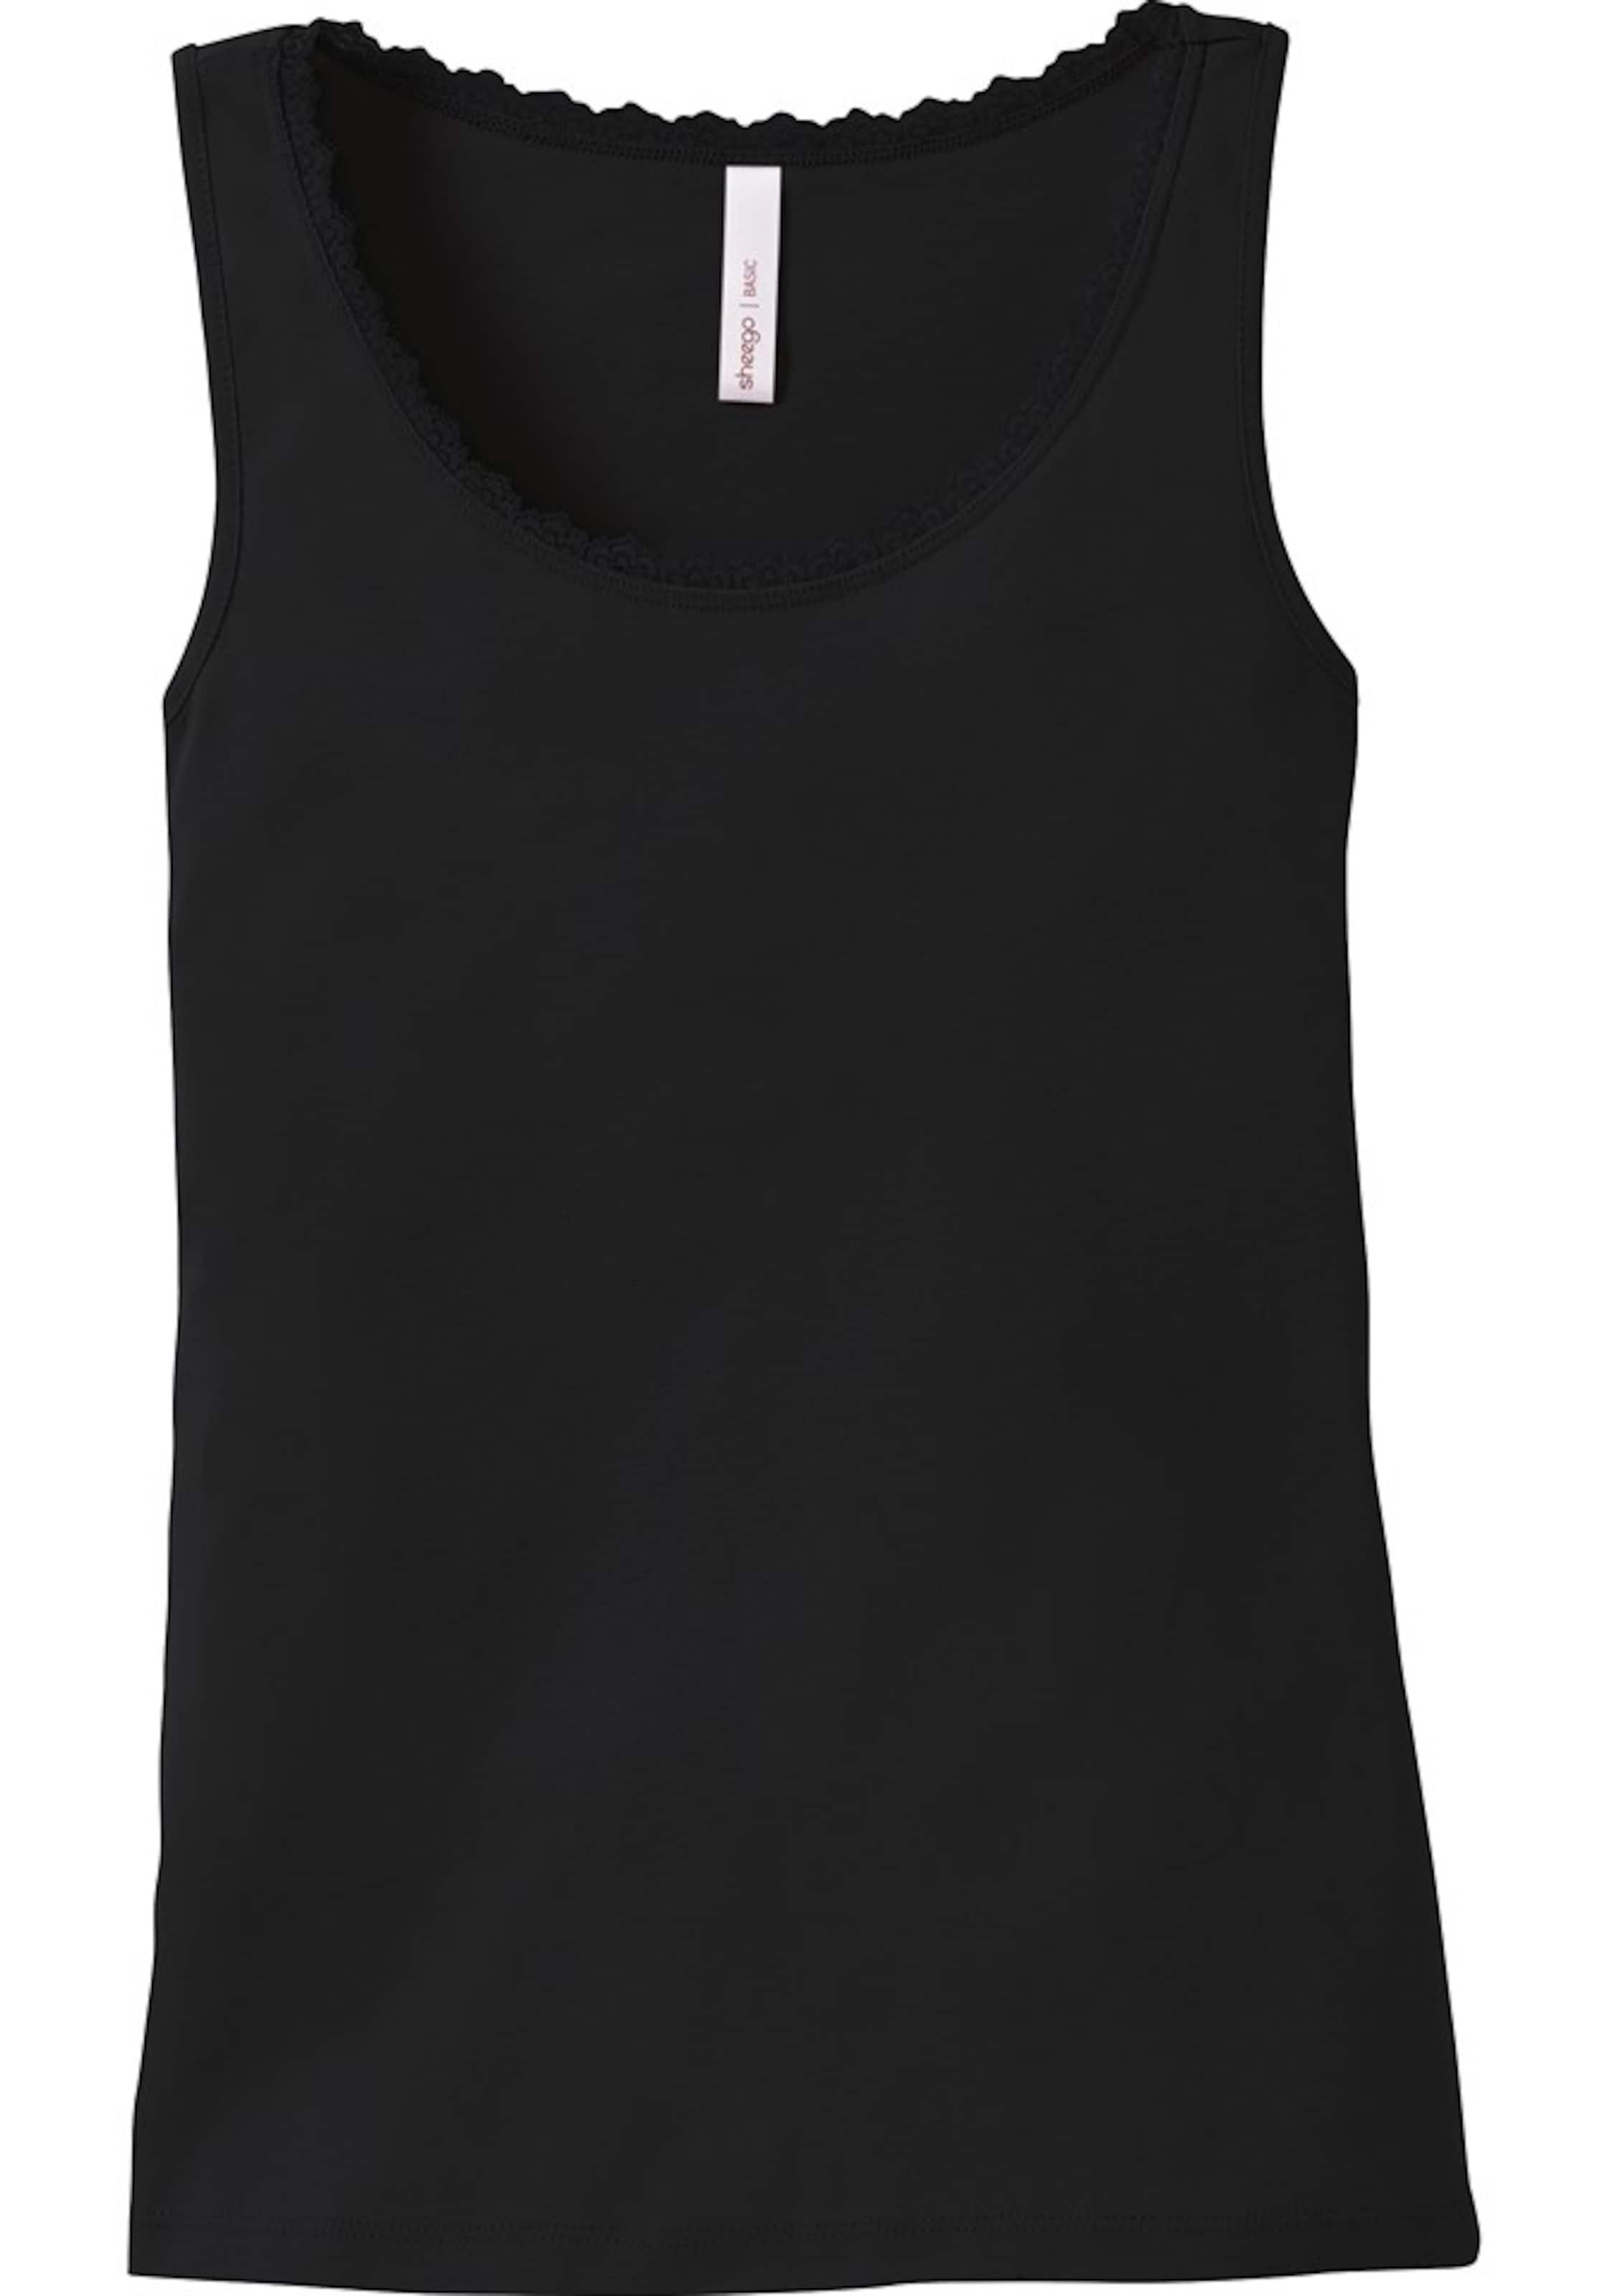 Tanktop Denim Basic Sheego Casual In Black rxdBoeC